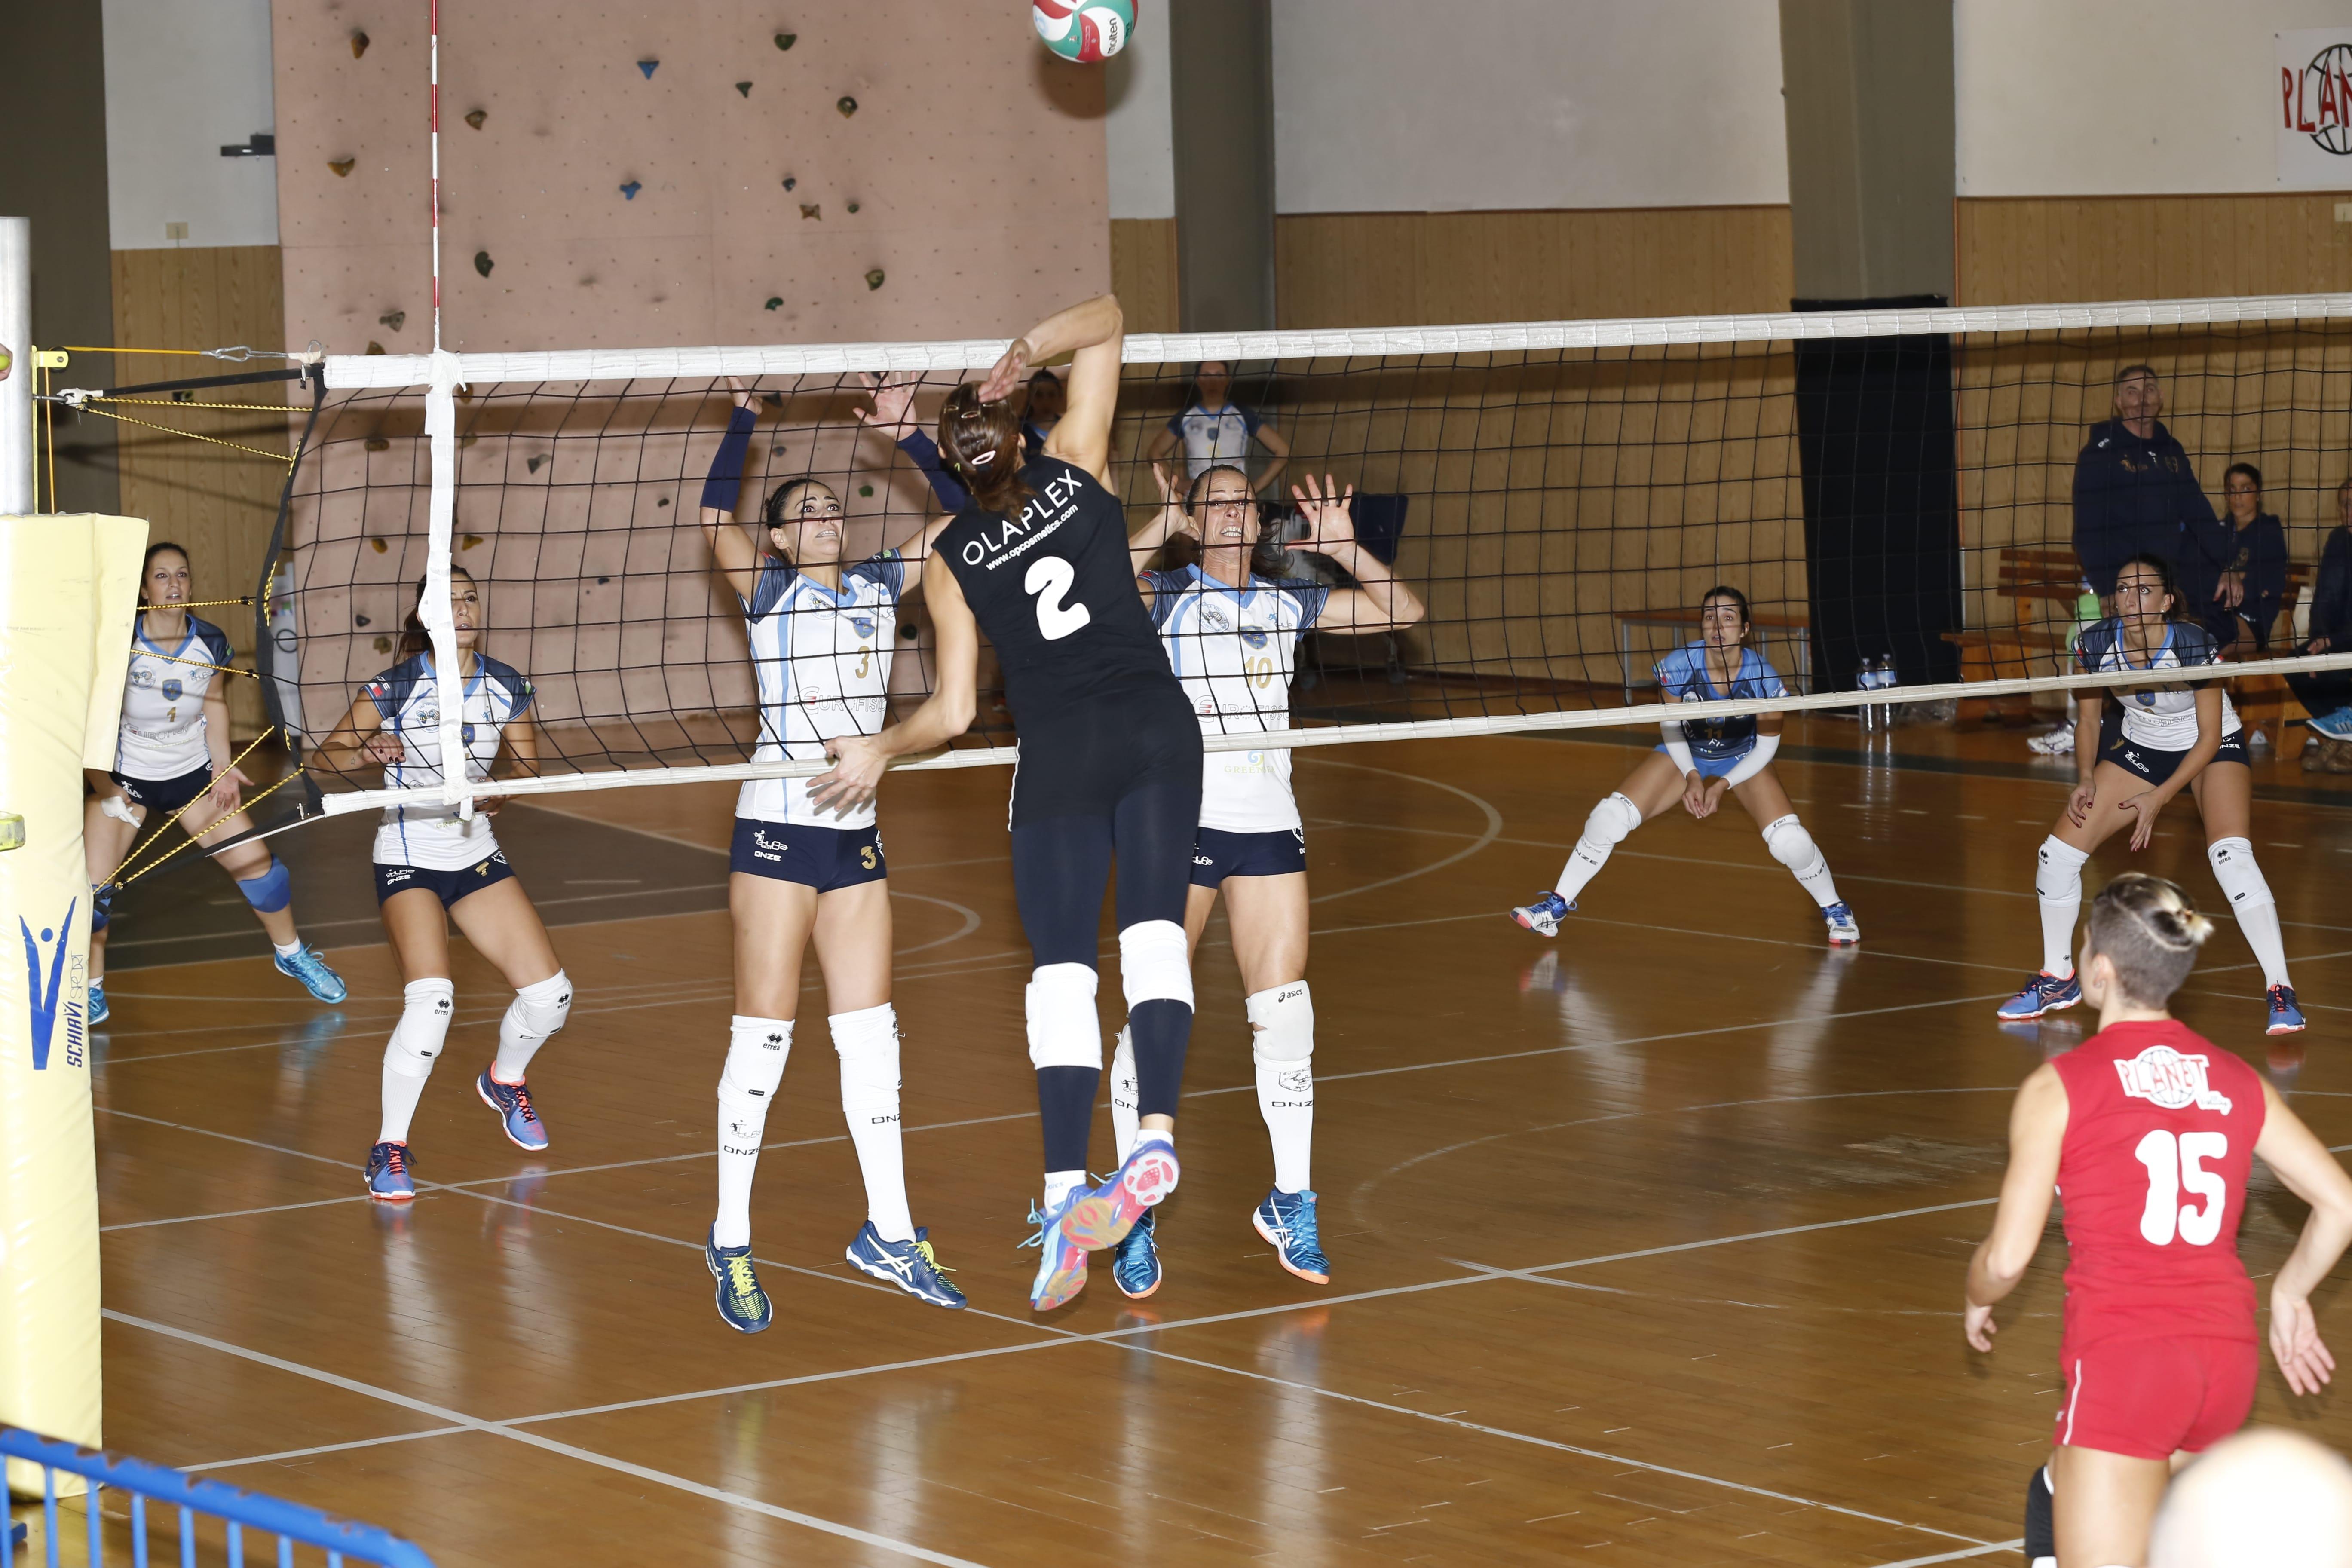 Partita 4 Planet Volley - OP e lo sport